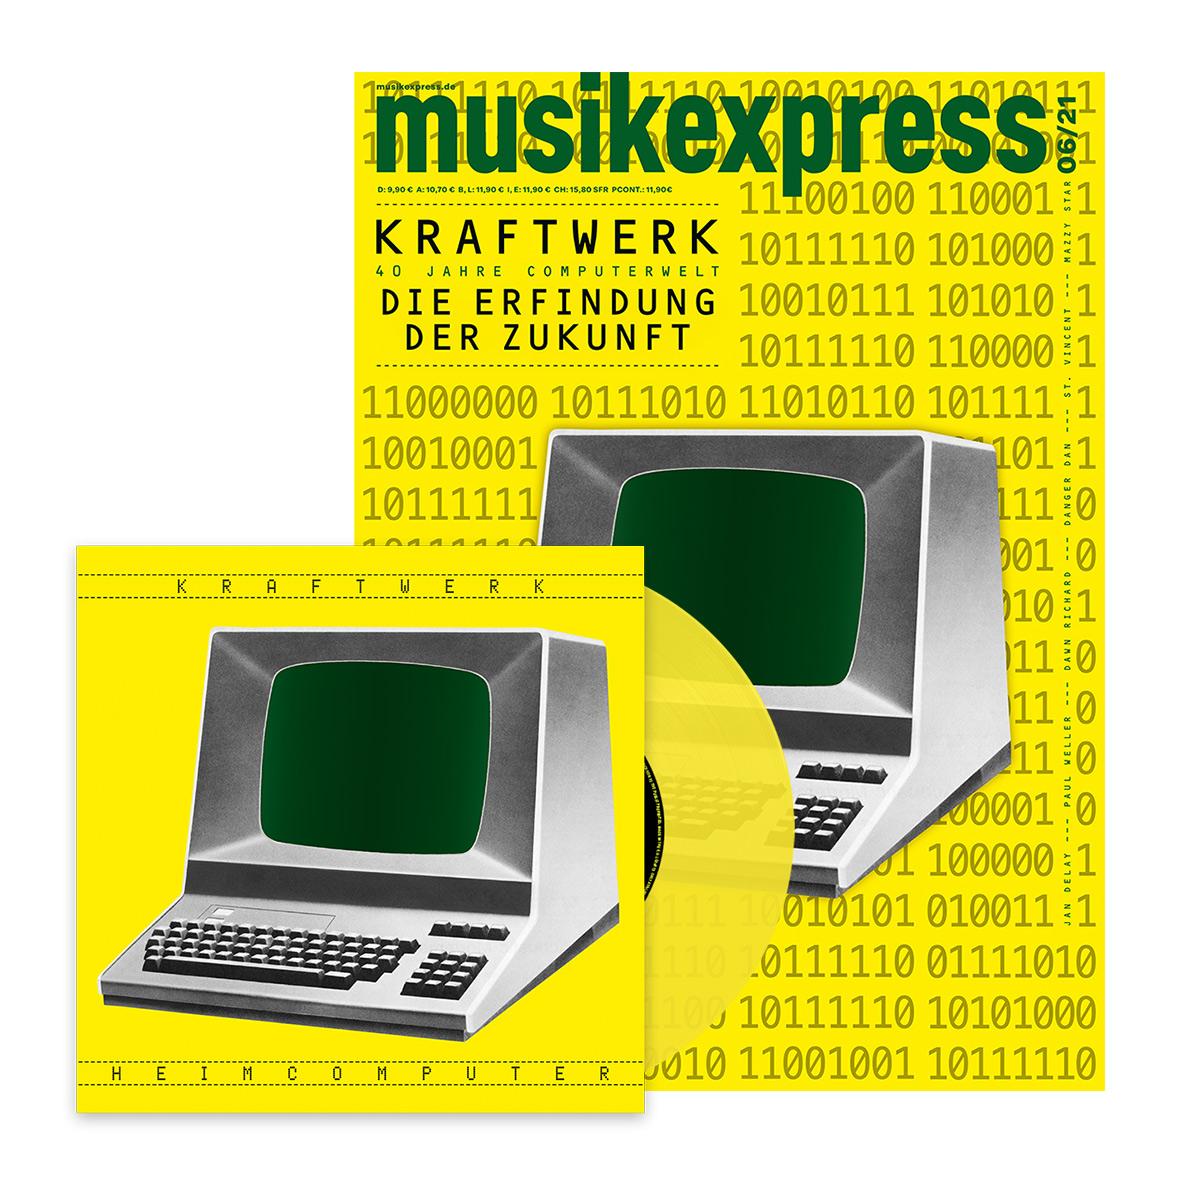 MusikExpress 'Heimcomputer' single and magazine covers